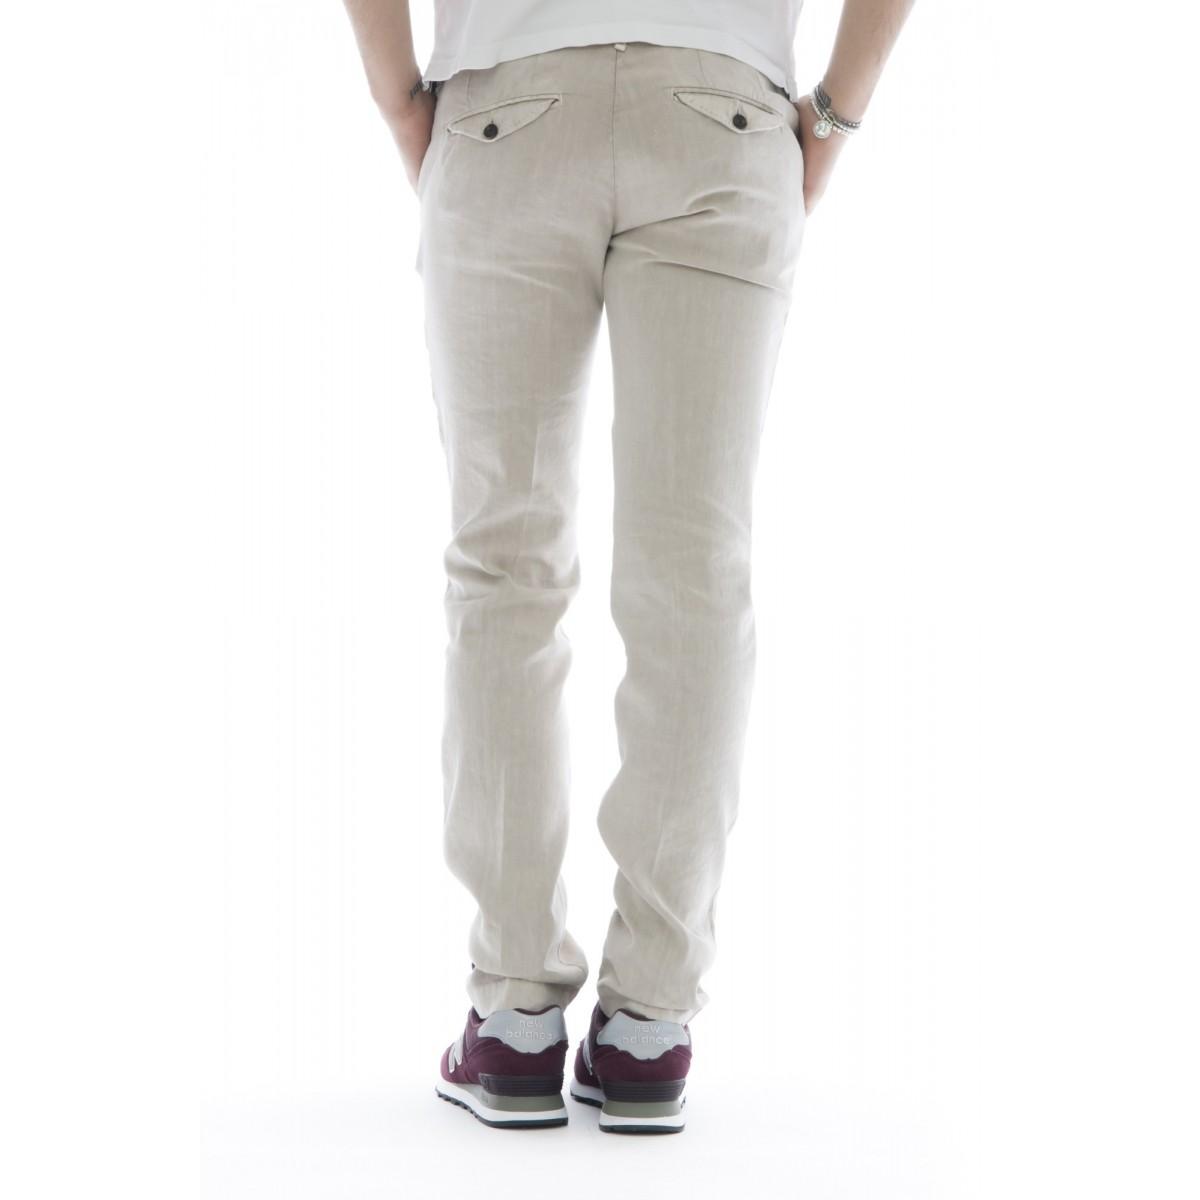 Pantaloni - 08l 79 cotone lino lavato